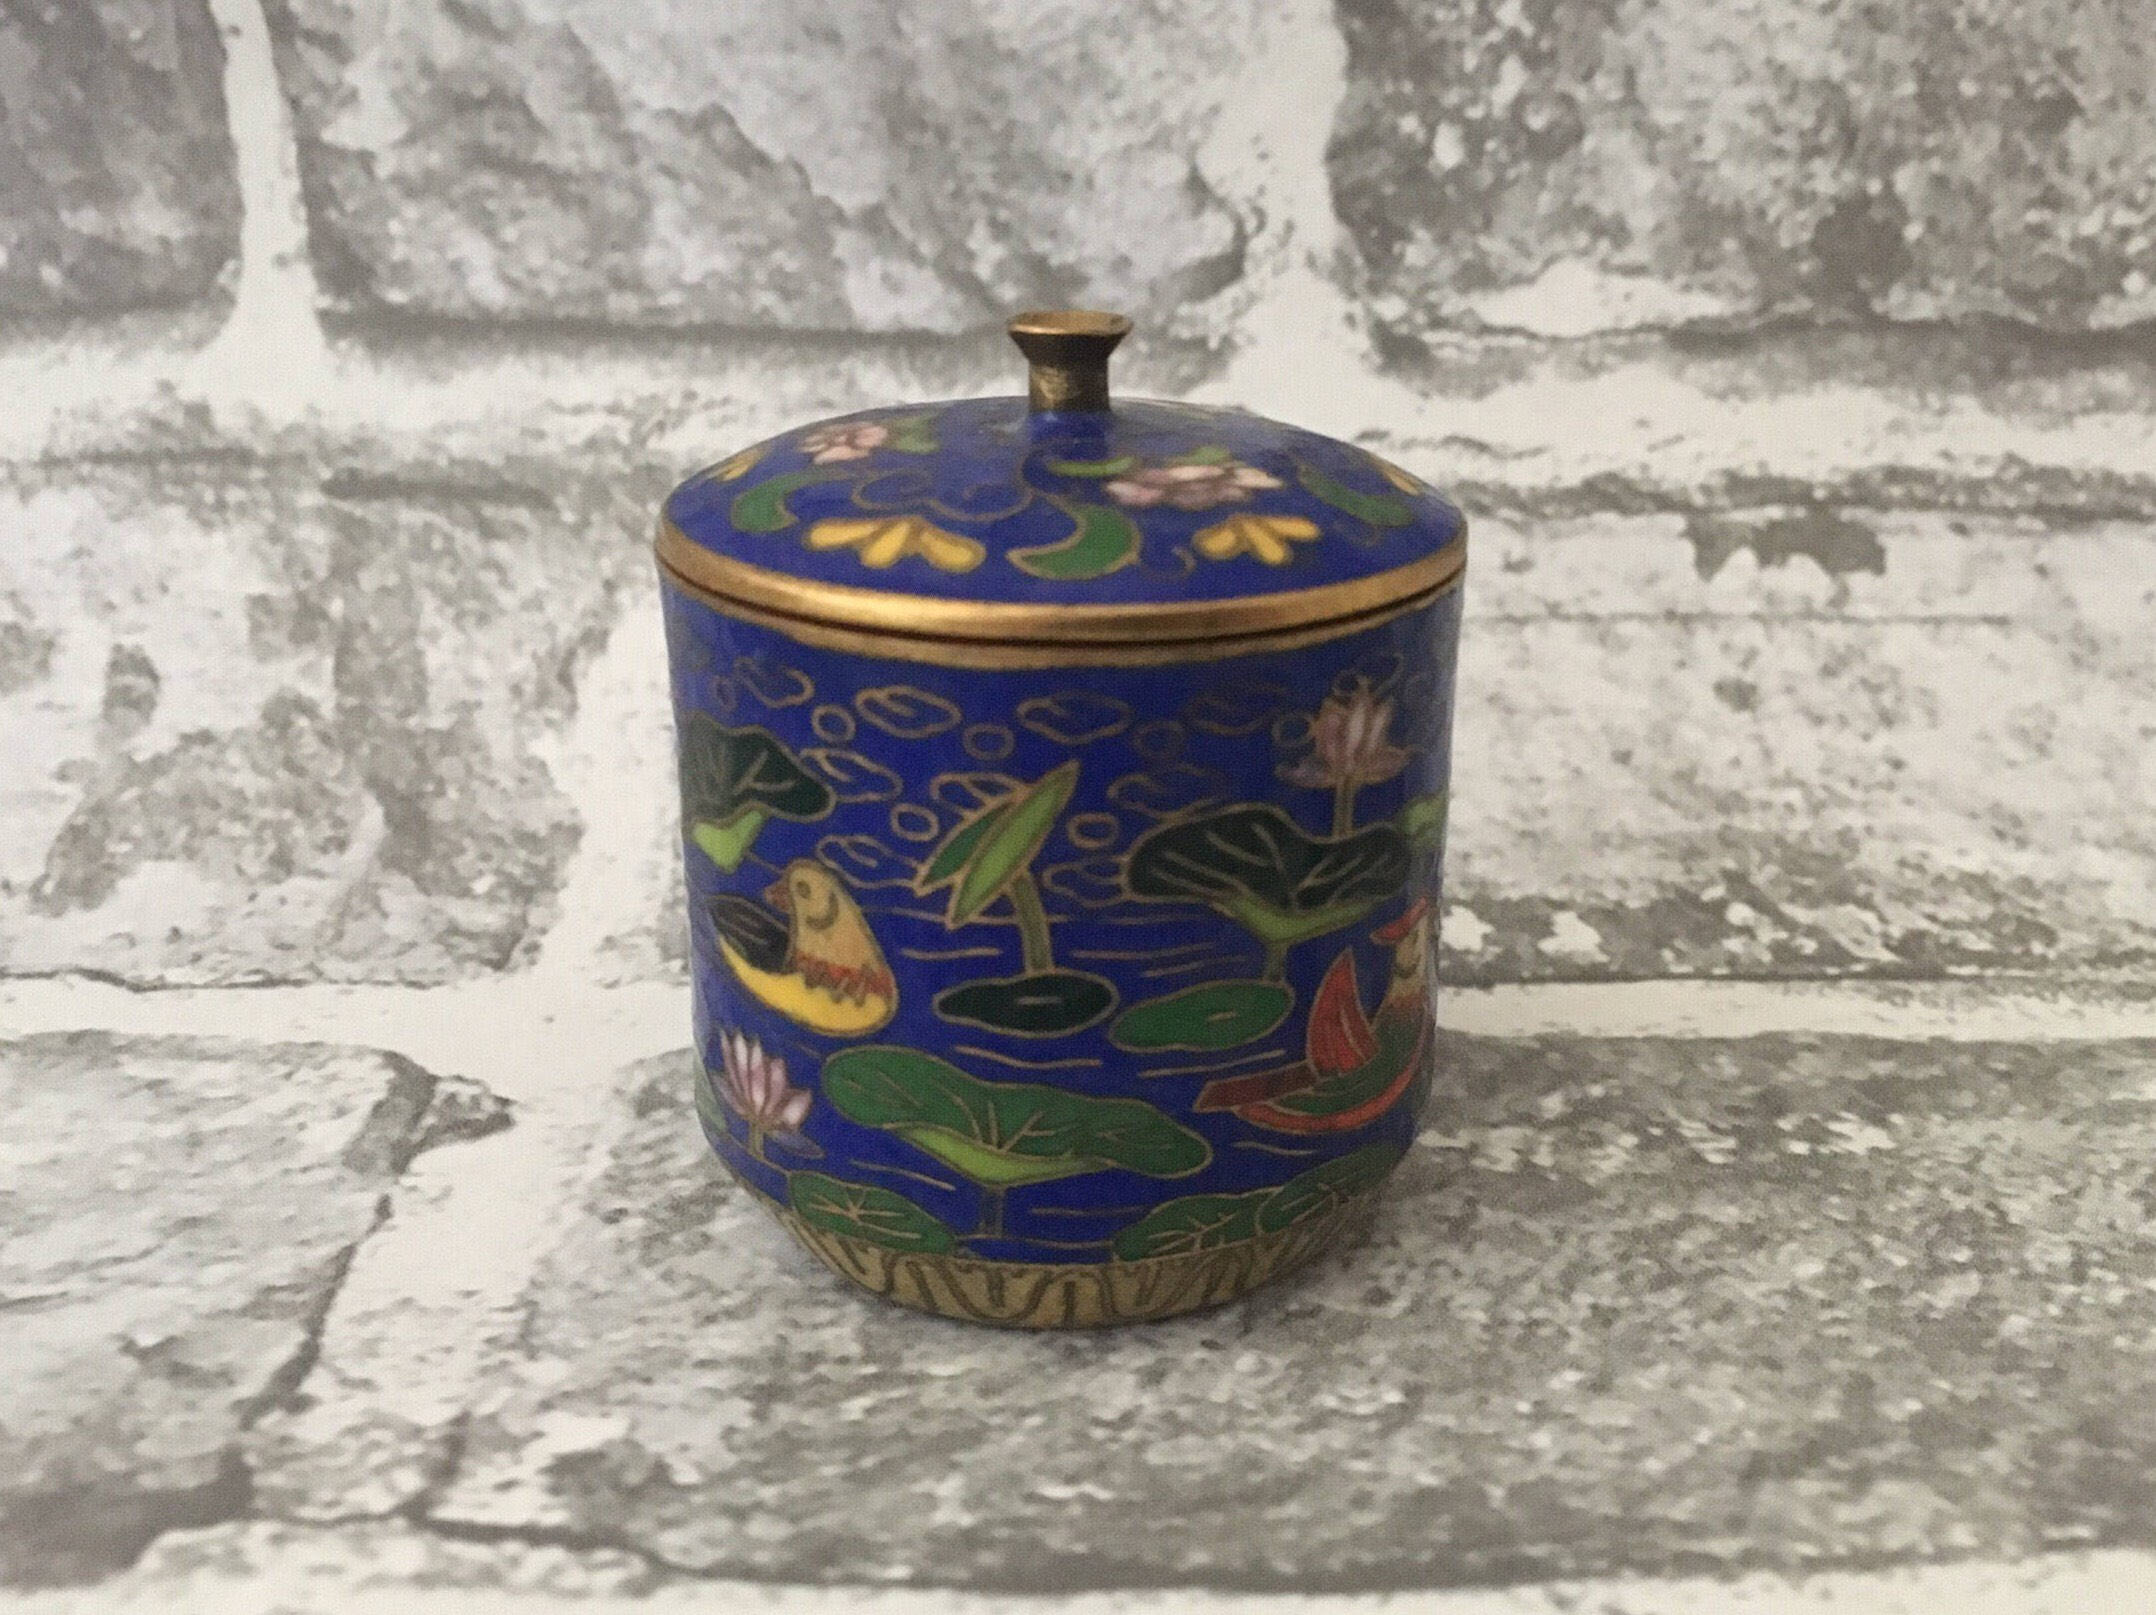 Chinese Cloisonn Enamel Ring Box Trinket Box Enamel Ducks In Water